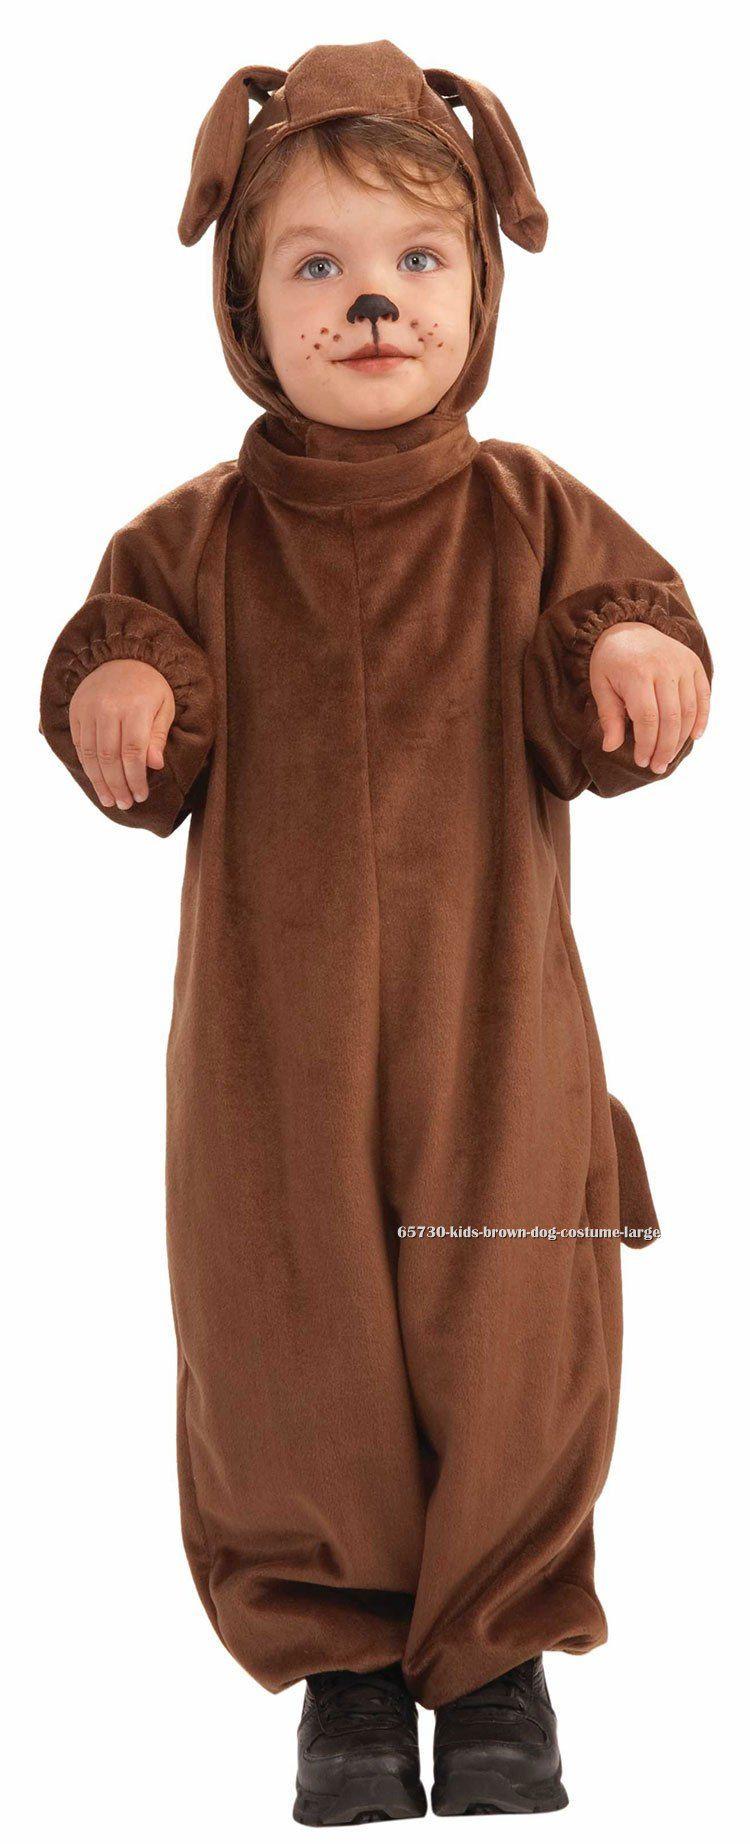 DIY Dog Costume For Kids  Kids Brown Dog Costume $16 99